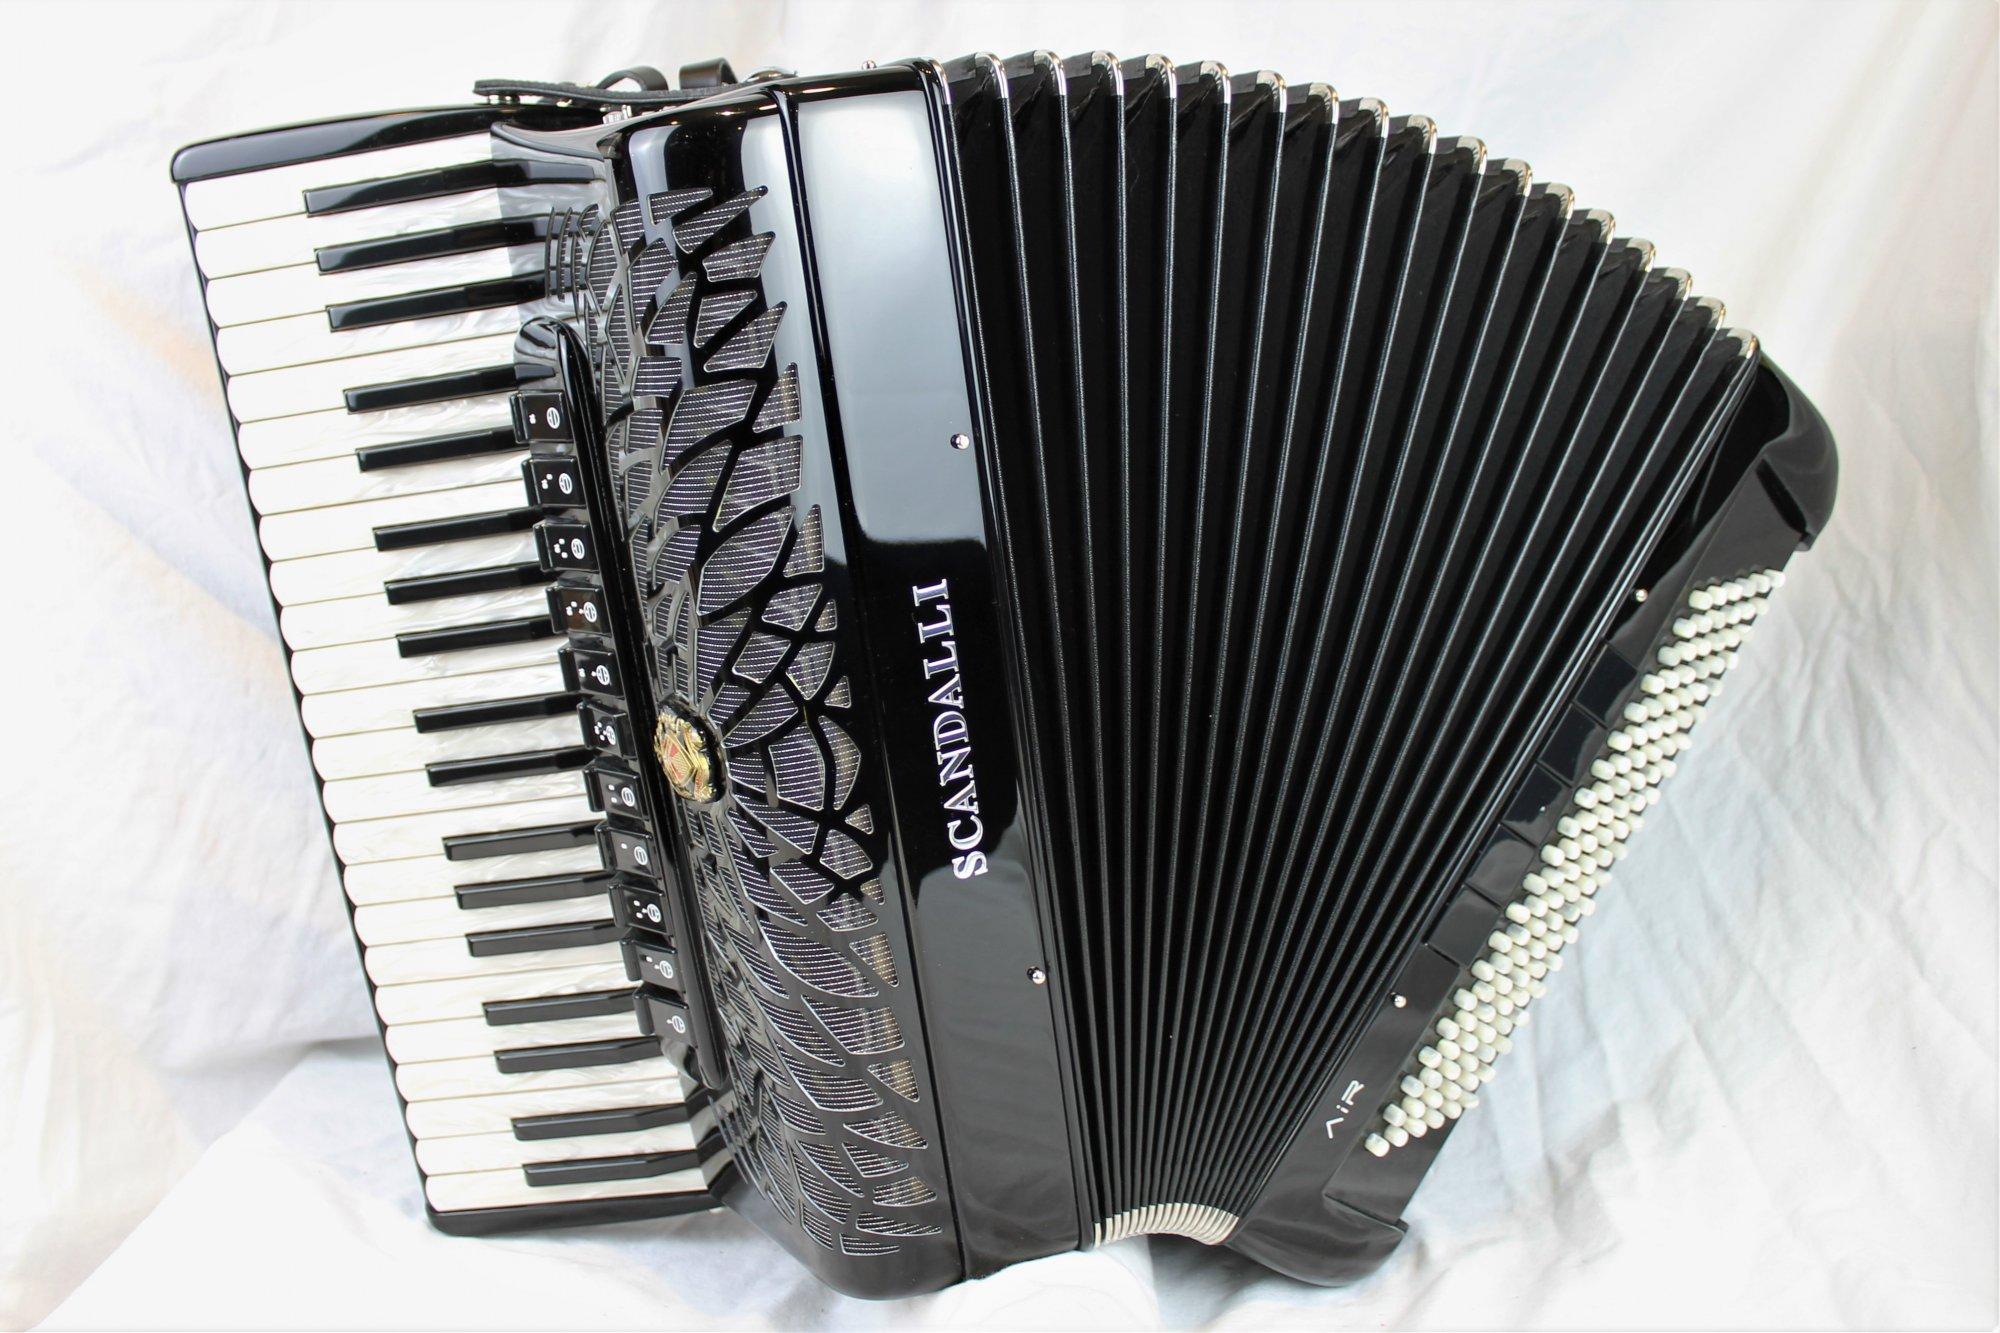 NEW Black Scandalli Air I S Piano Accordion LMMH 41 120